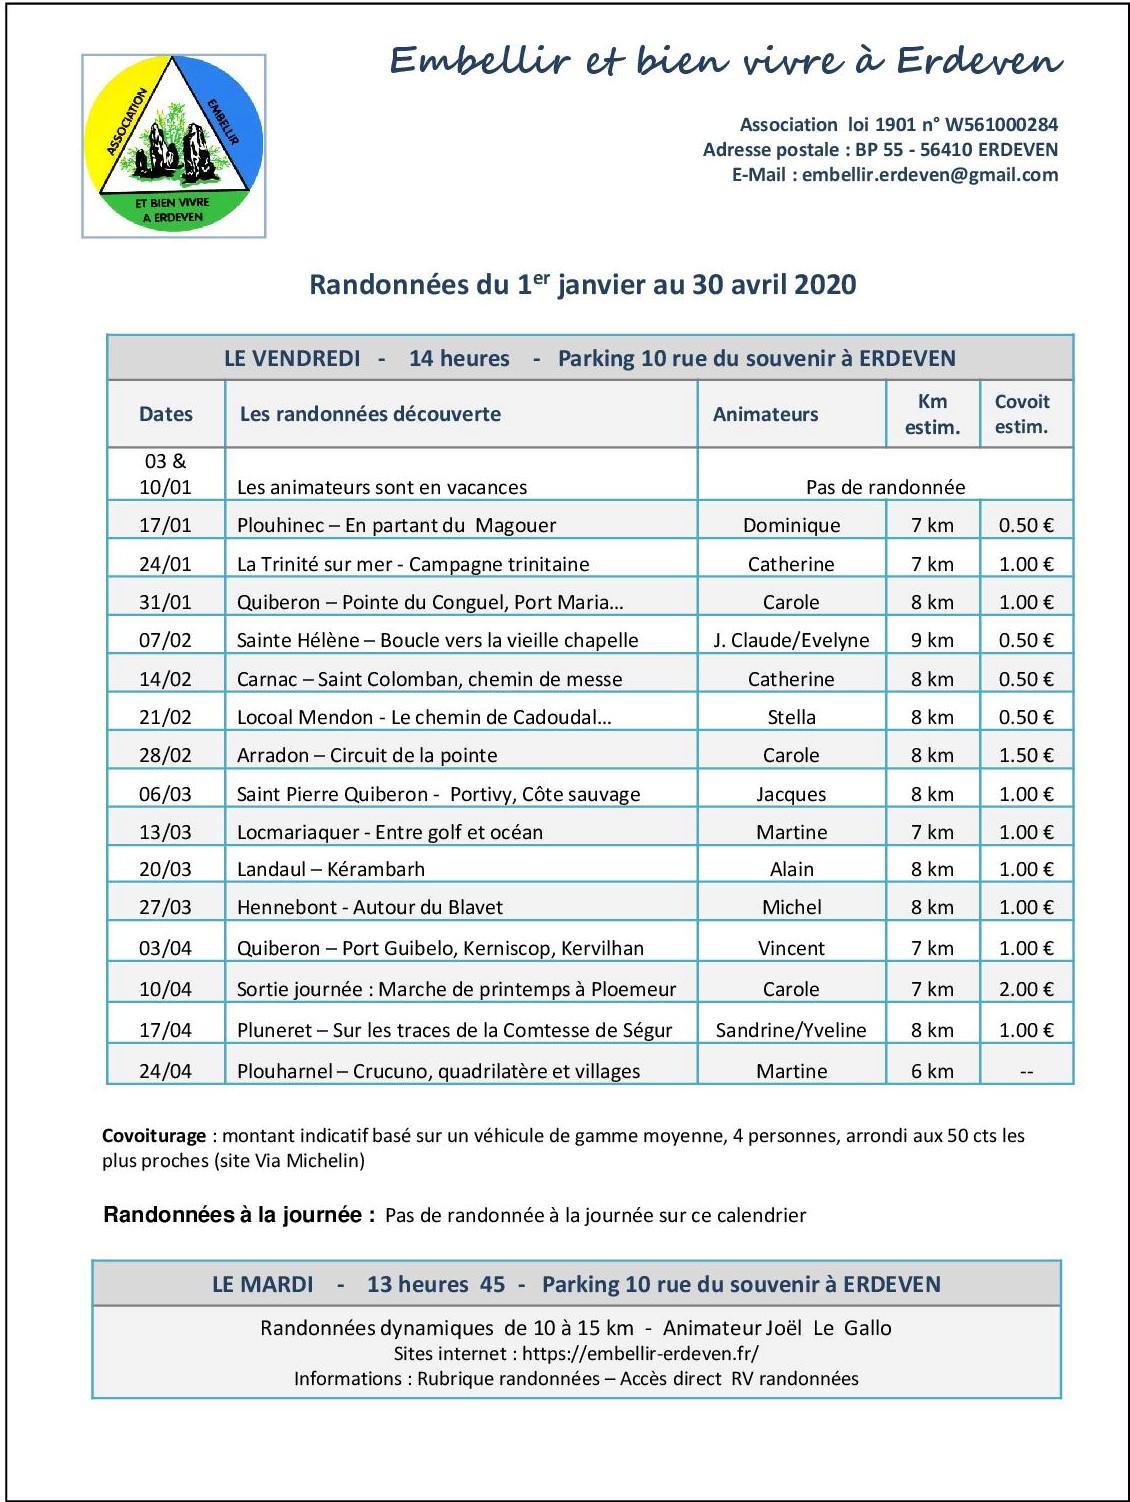 Randos calendriers 01 à 04 2020.jpg